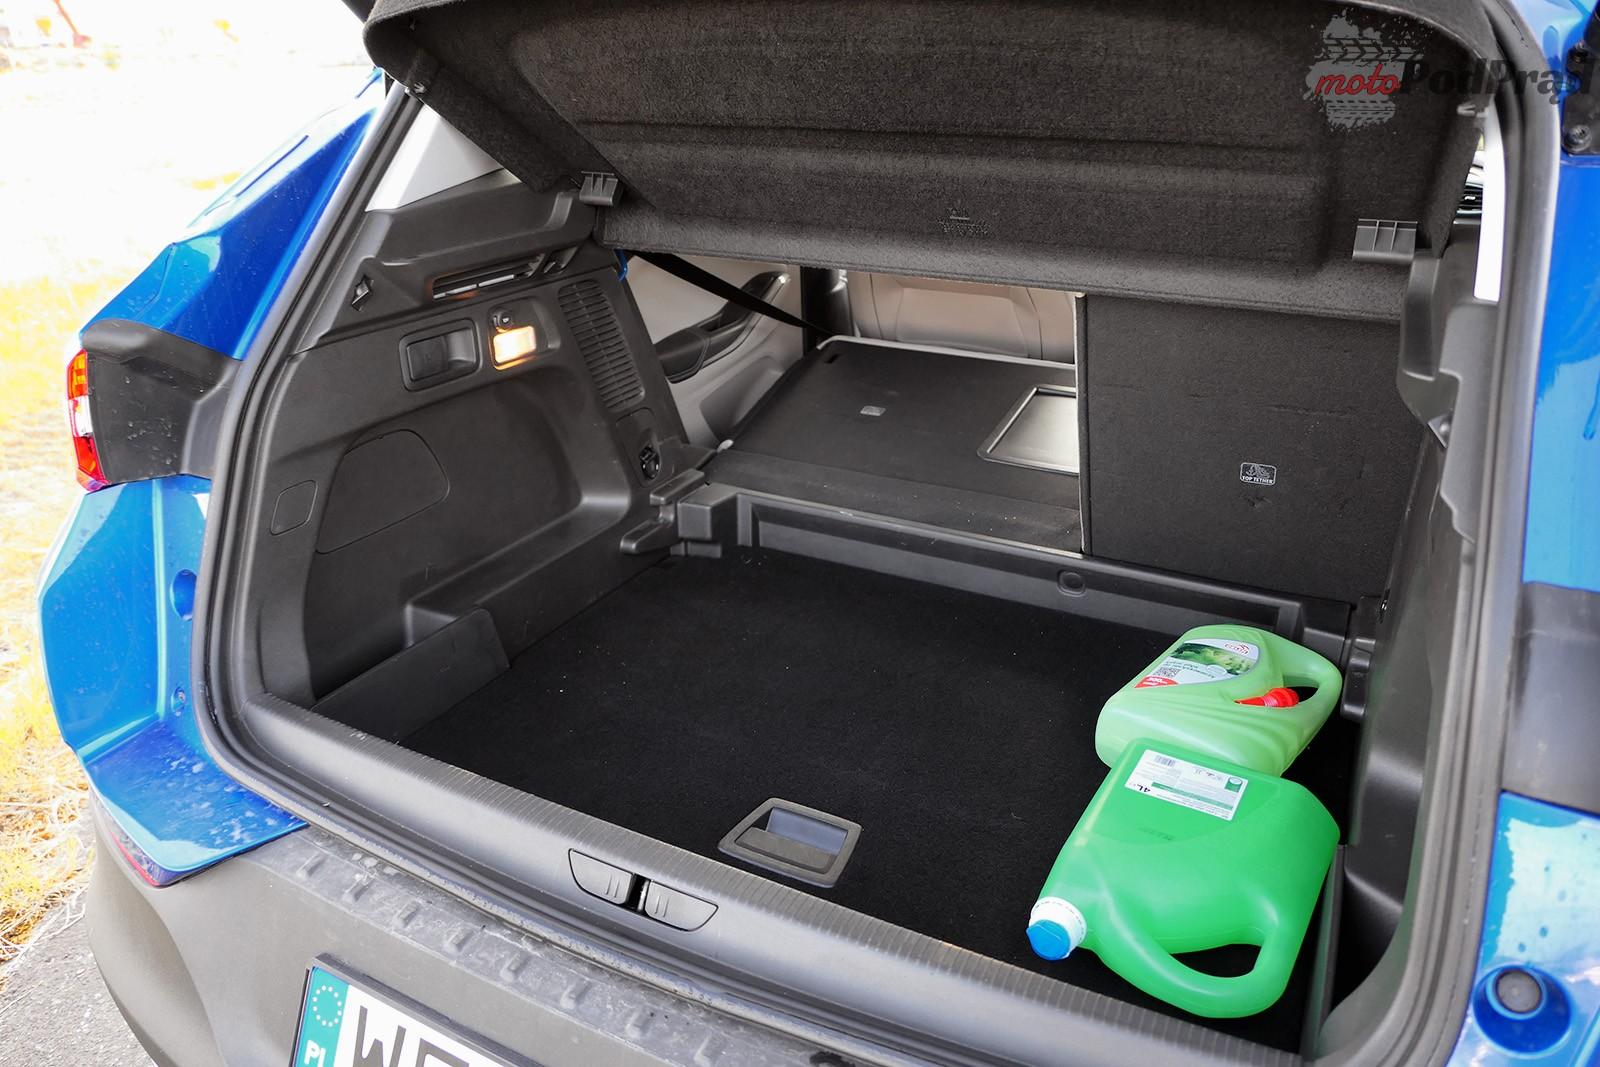 Opel Grandland X 27 Test: Opel Grandland X 1.6 CDTI 120 KM   oszczędny typ